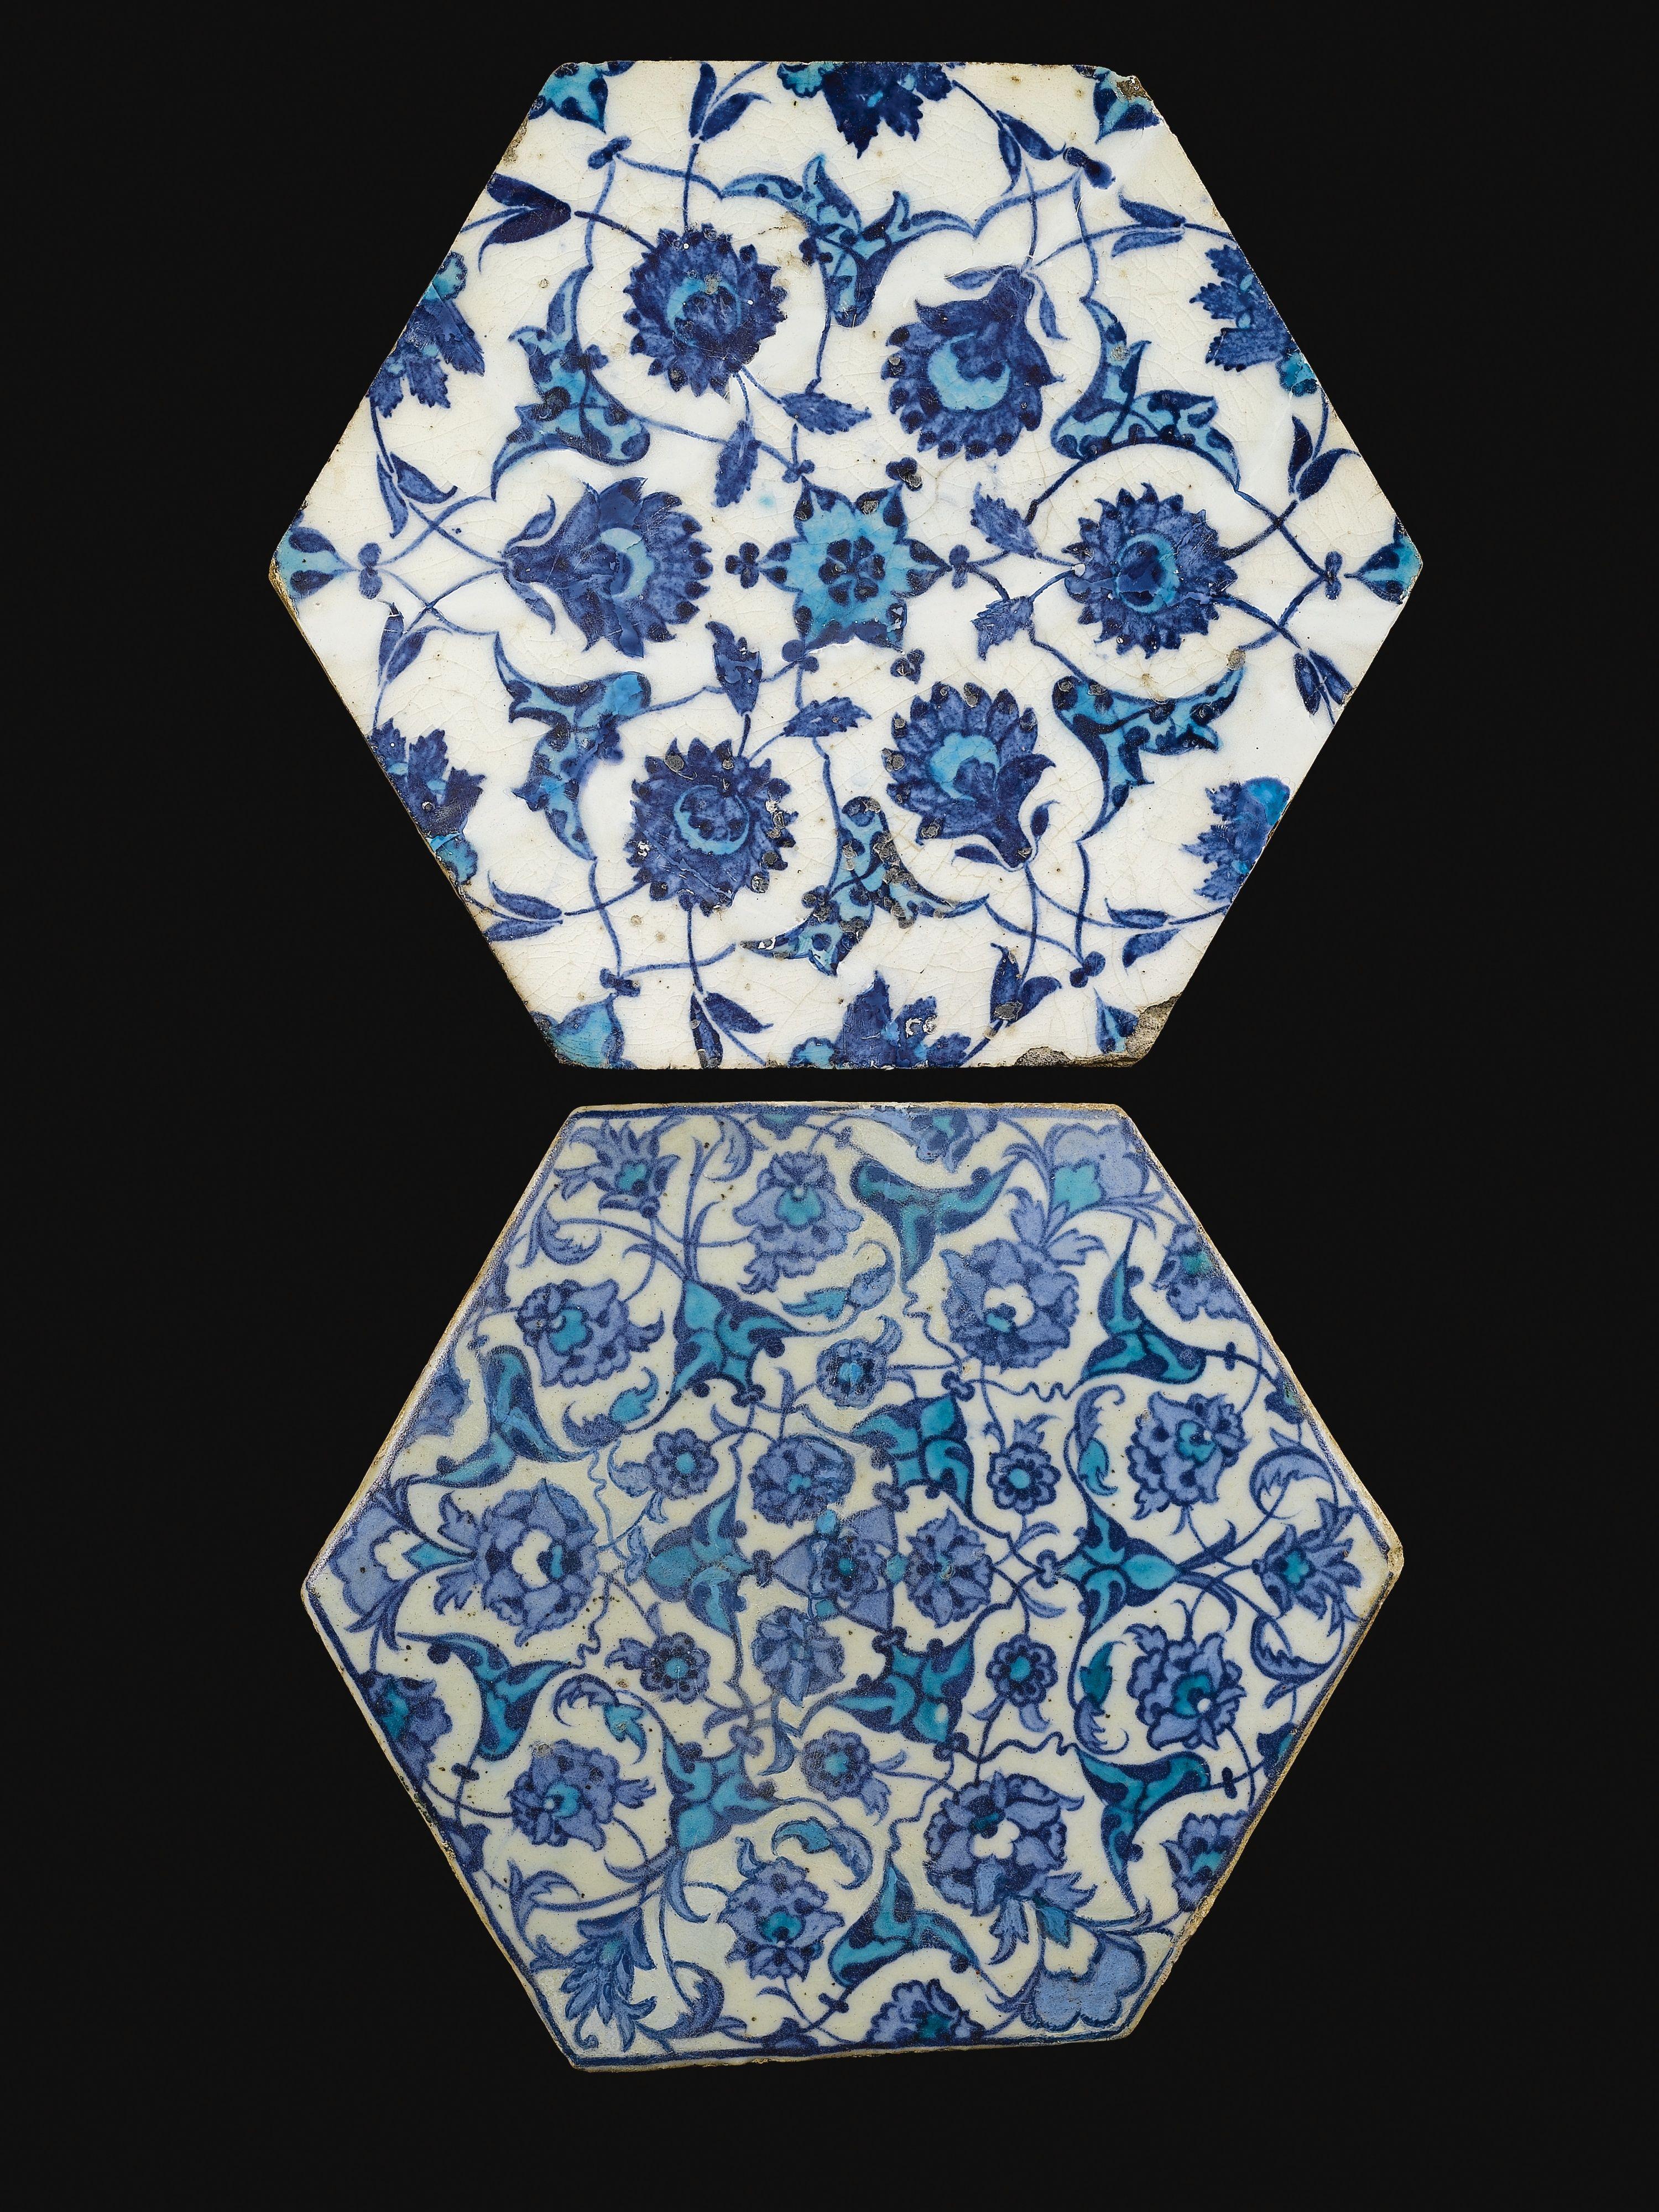 Iznik Hexagonal Tiles First Half Of 16th Century Turkey